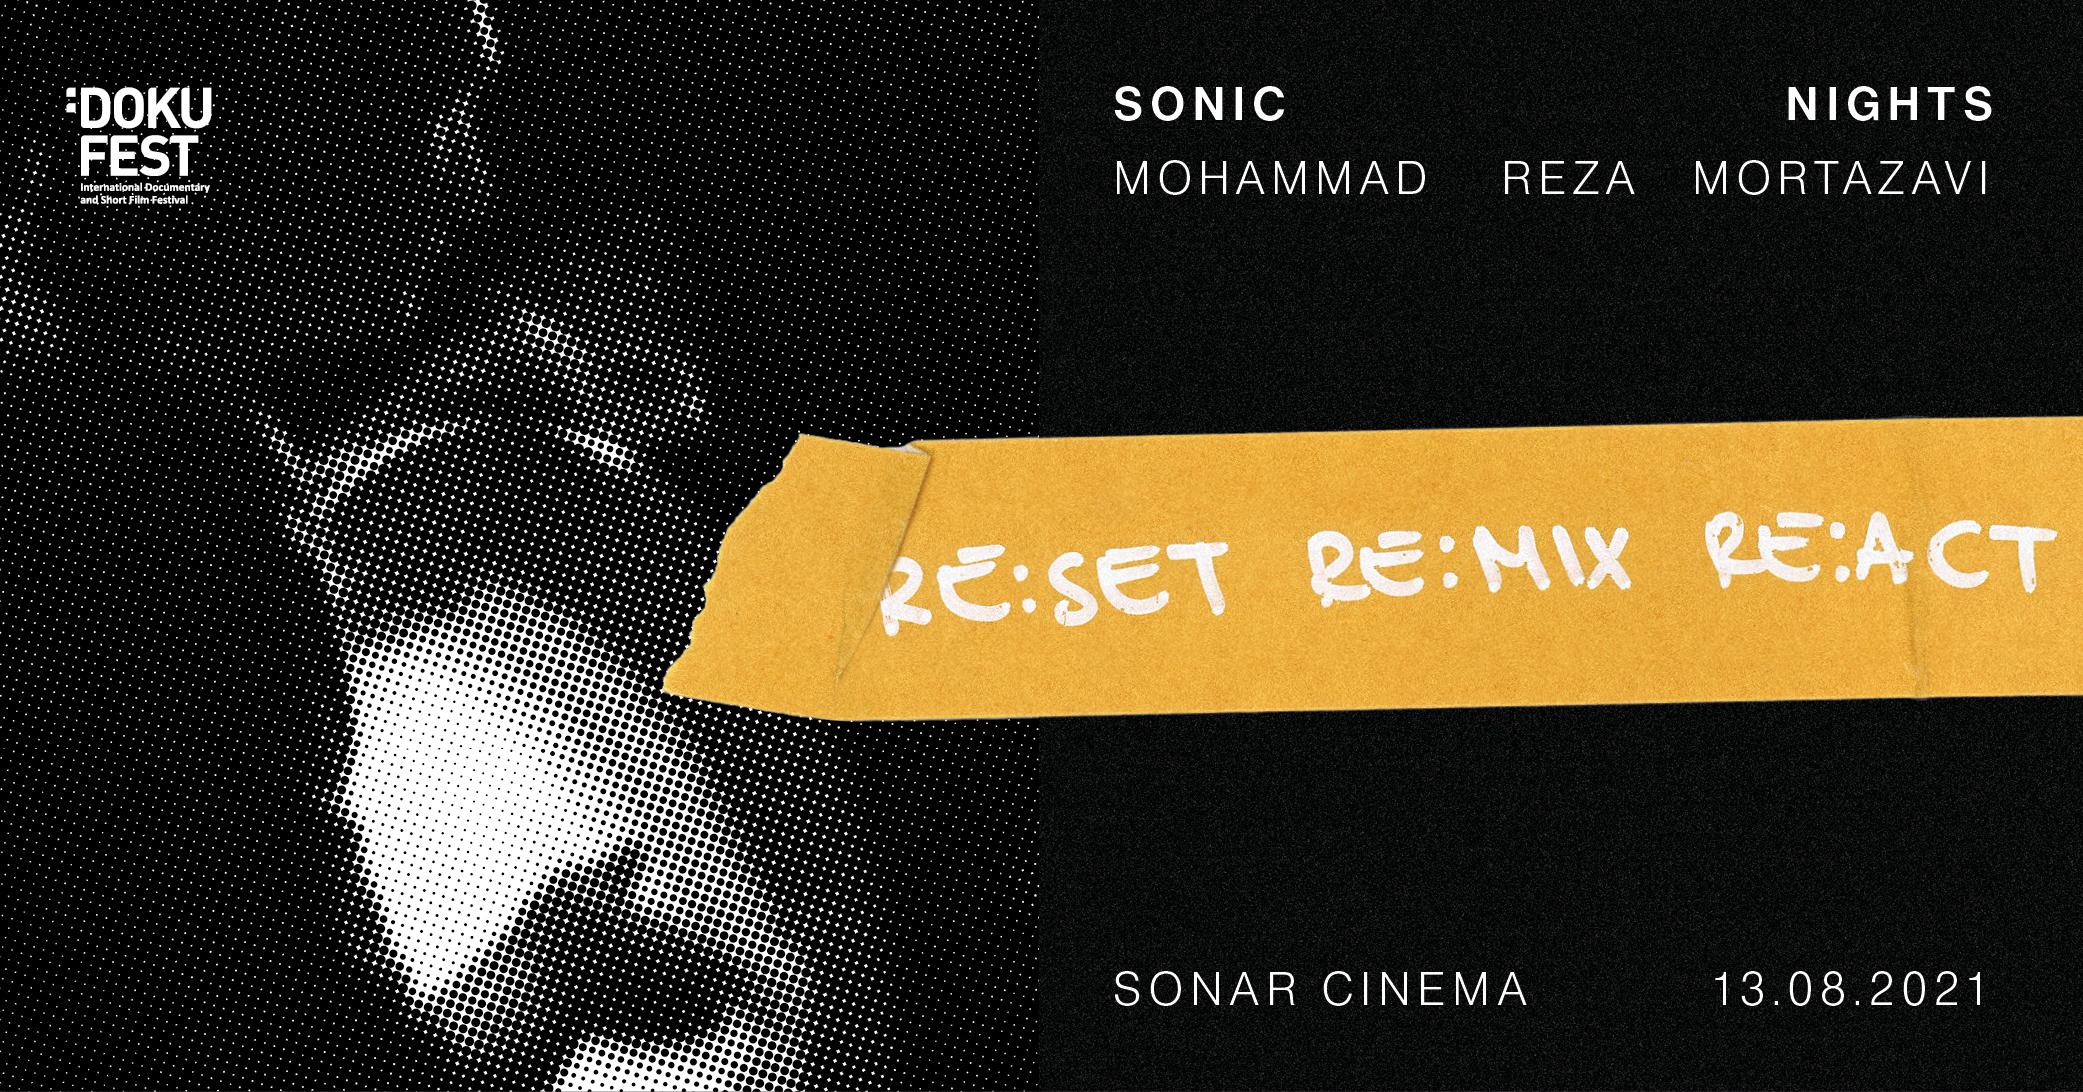 MOHAMMAD REZA MORTAZAVI @SONIC NIGHTS